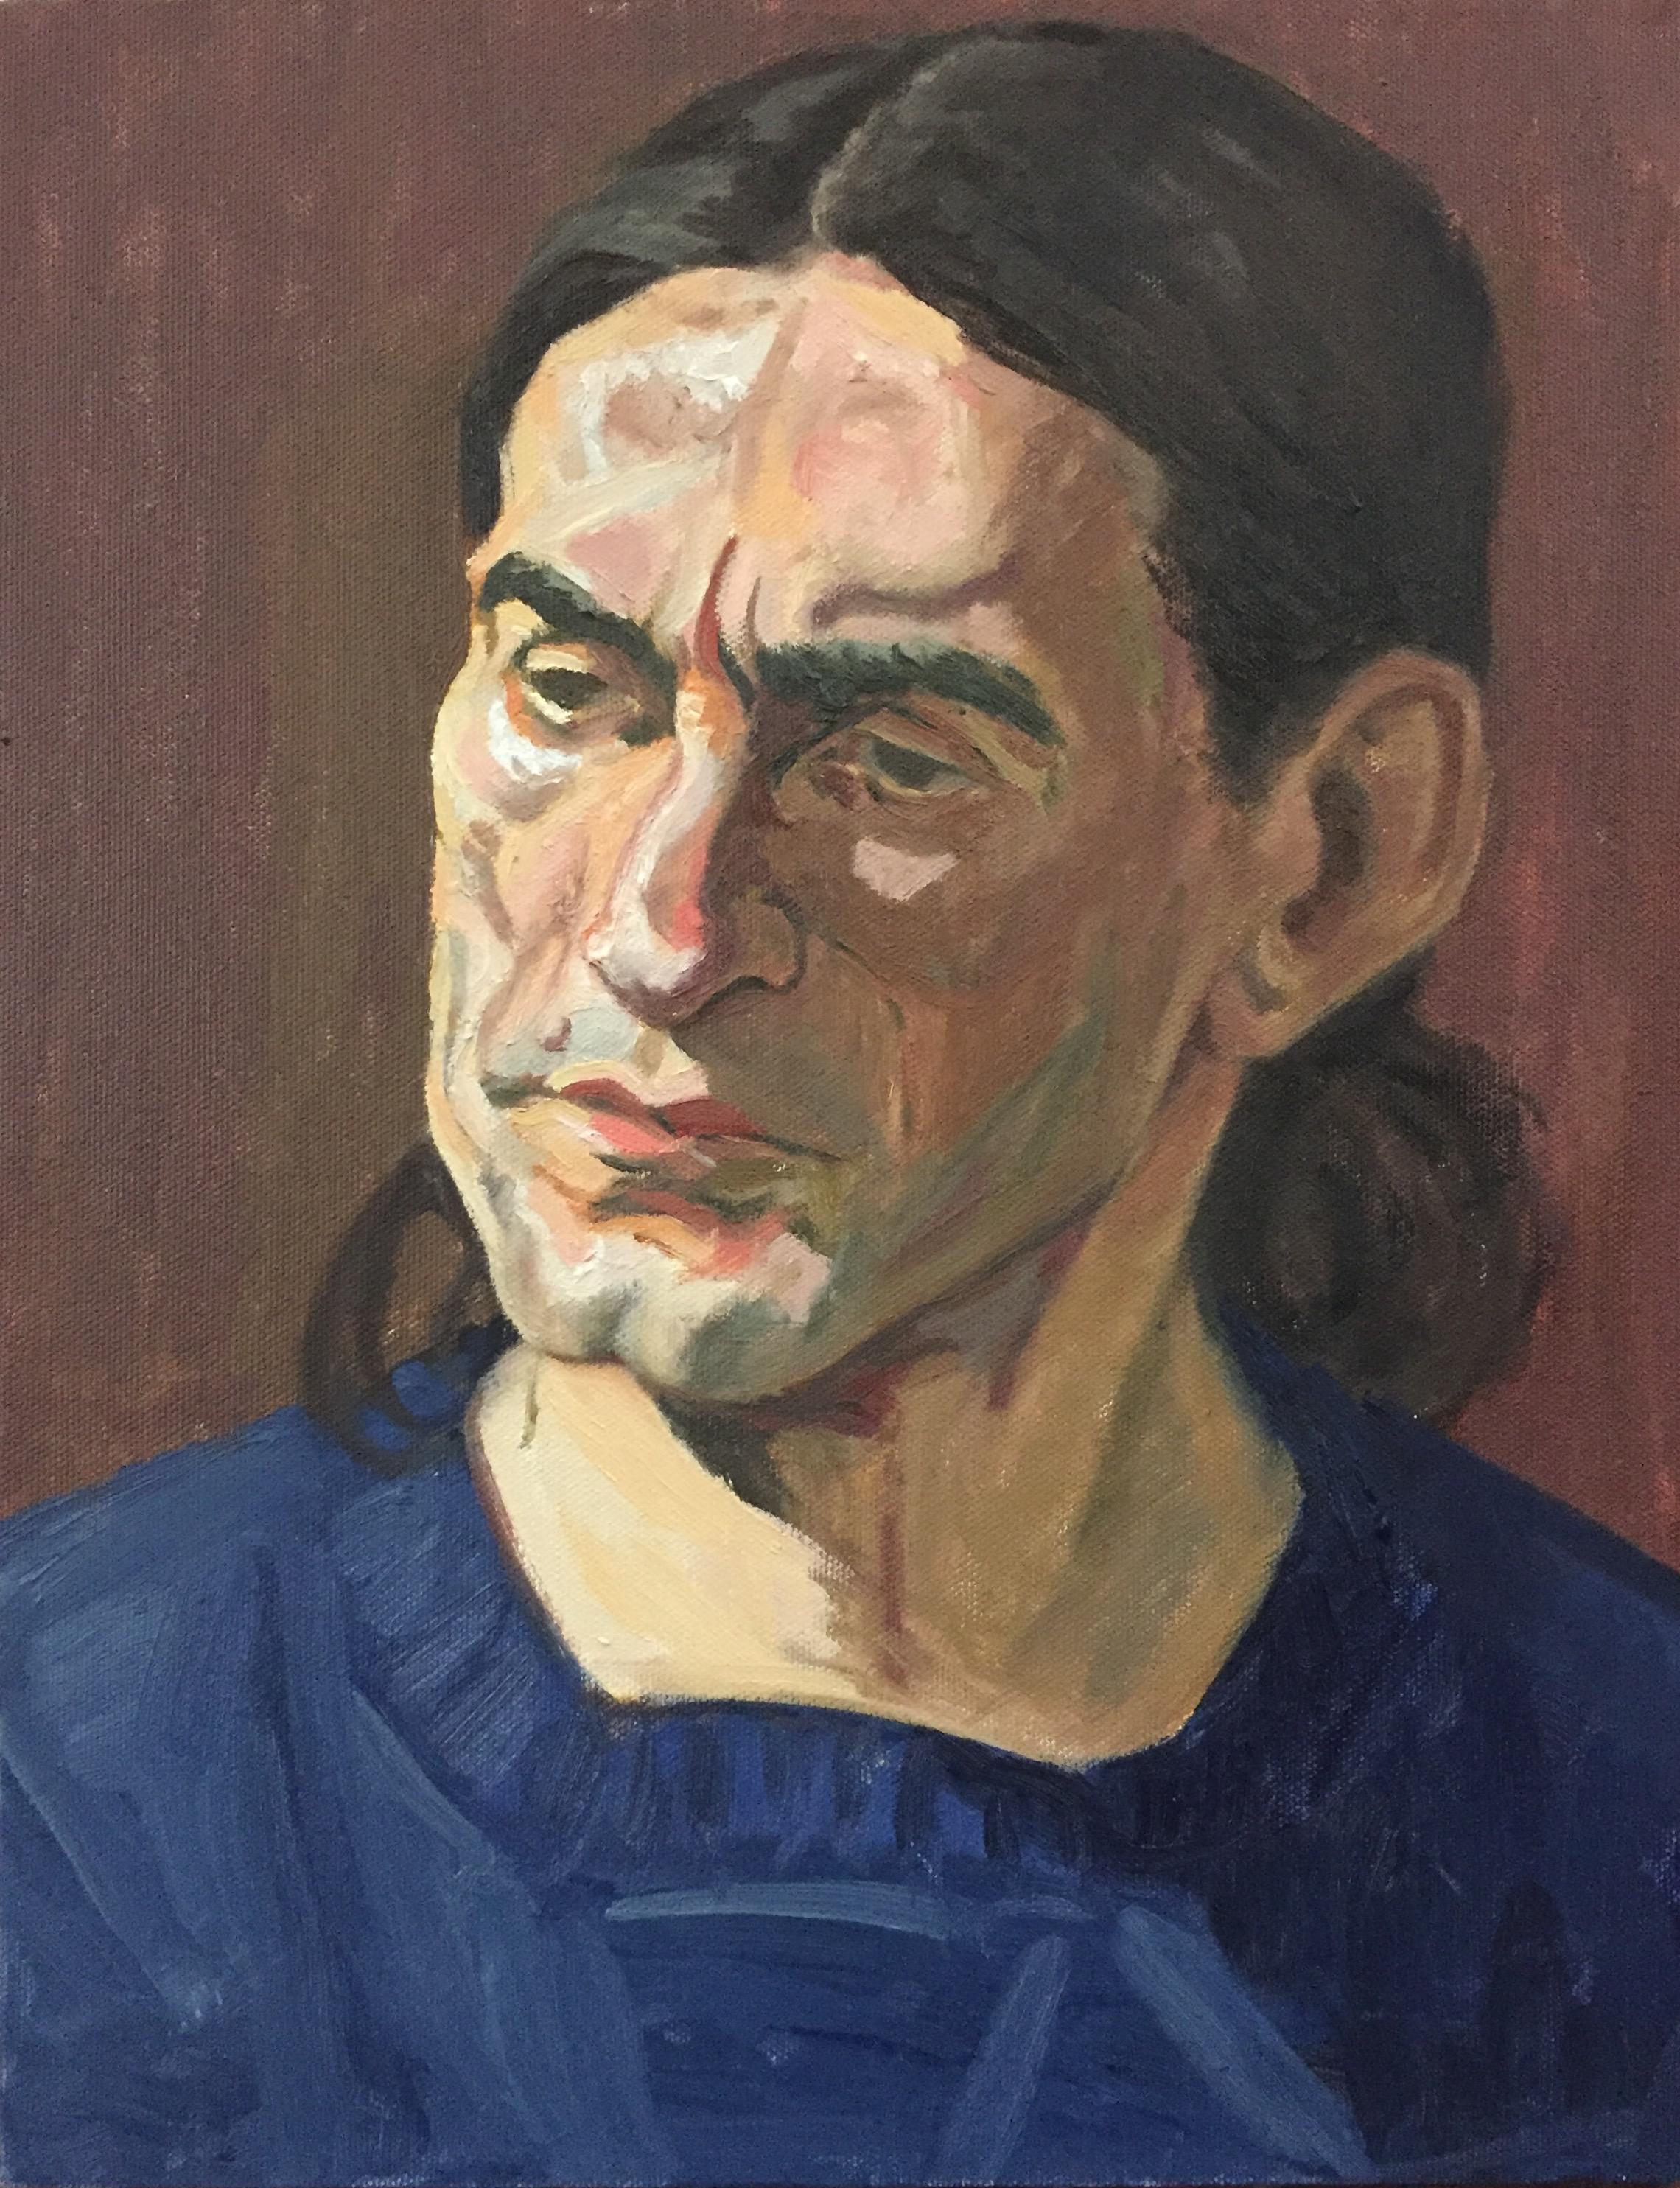 James  oil on canvas  11x14